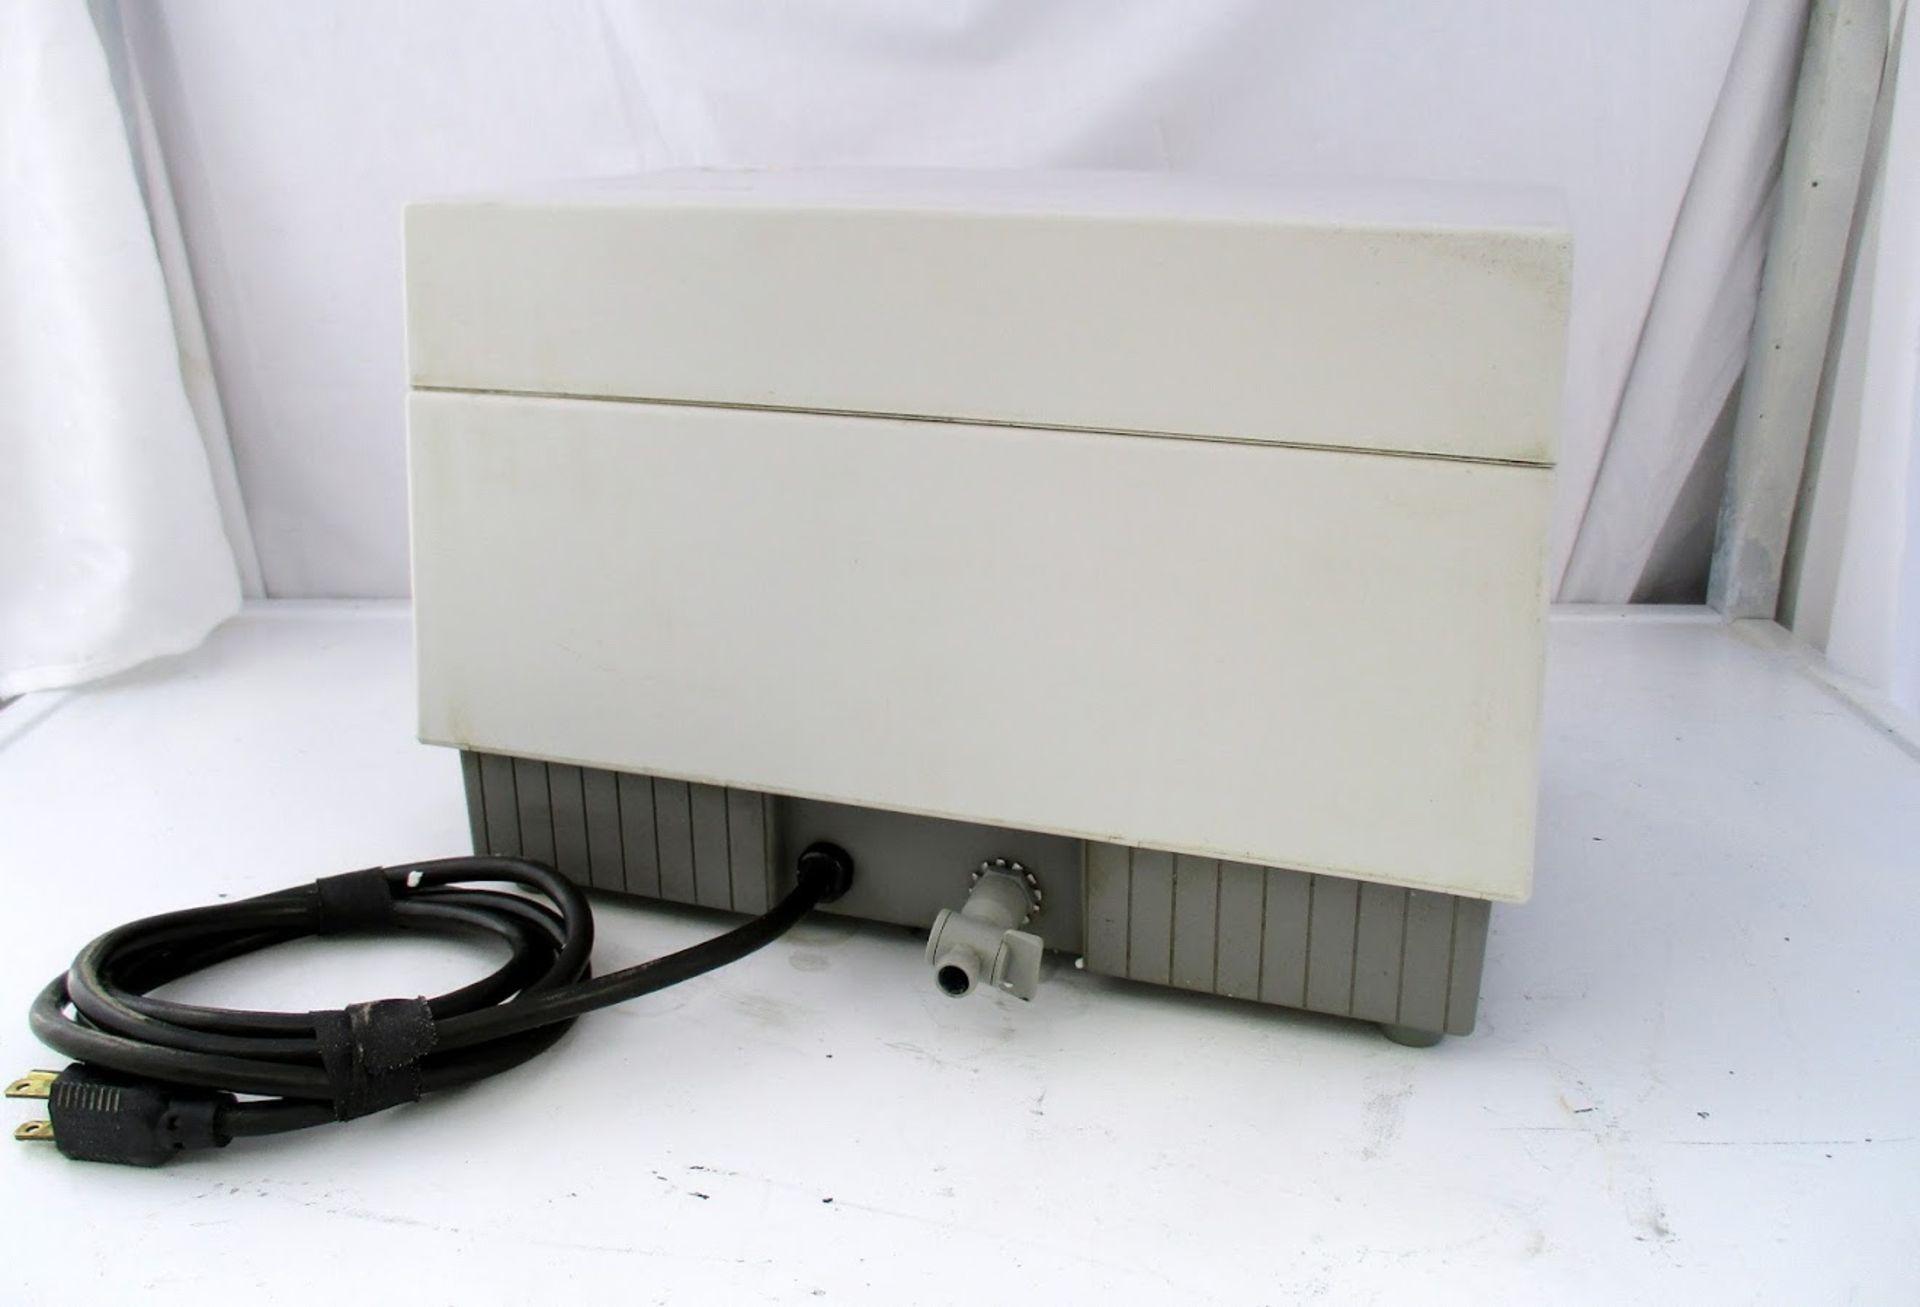 Whaledent Biosonic Ultrasonic Cleaner - Image 3 of 4